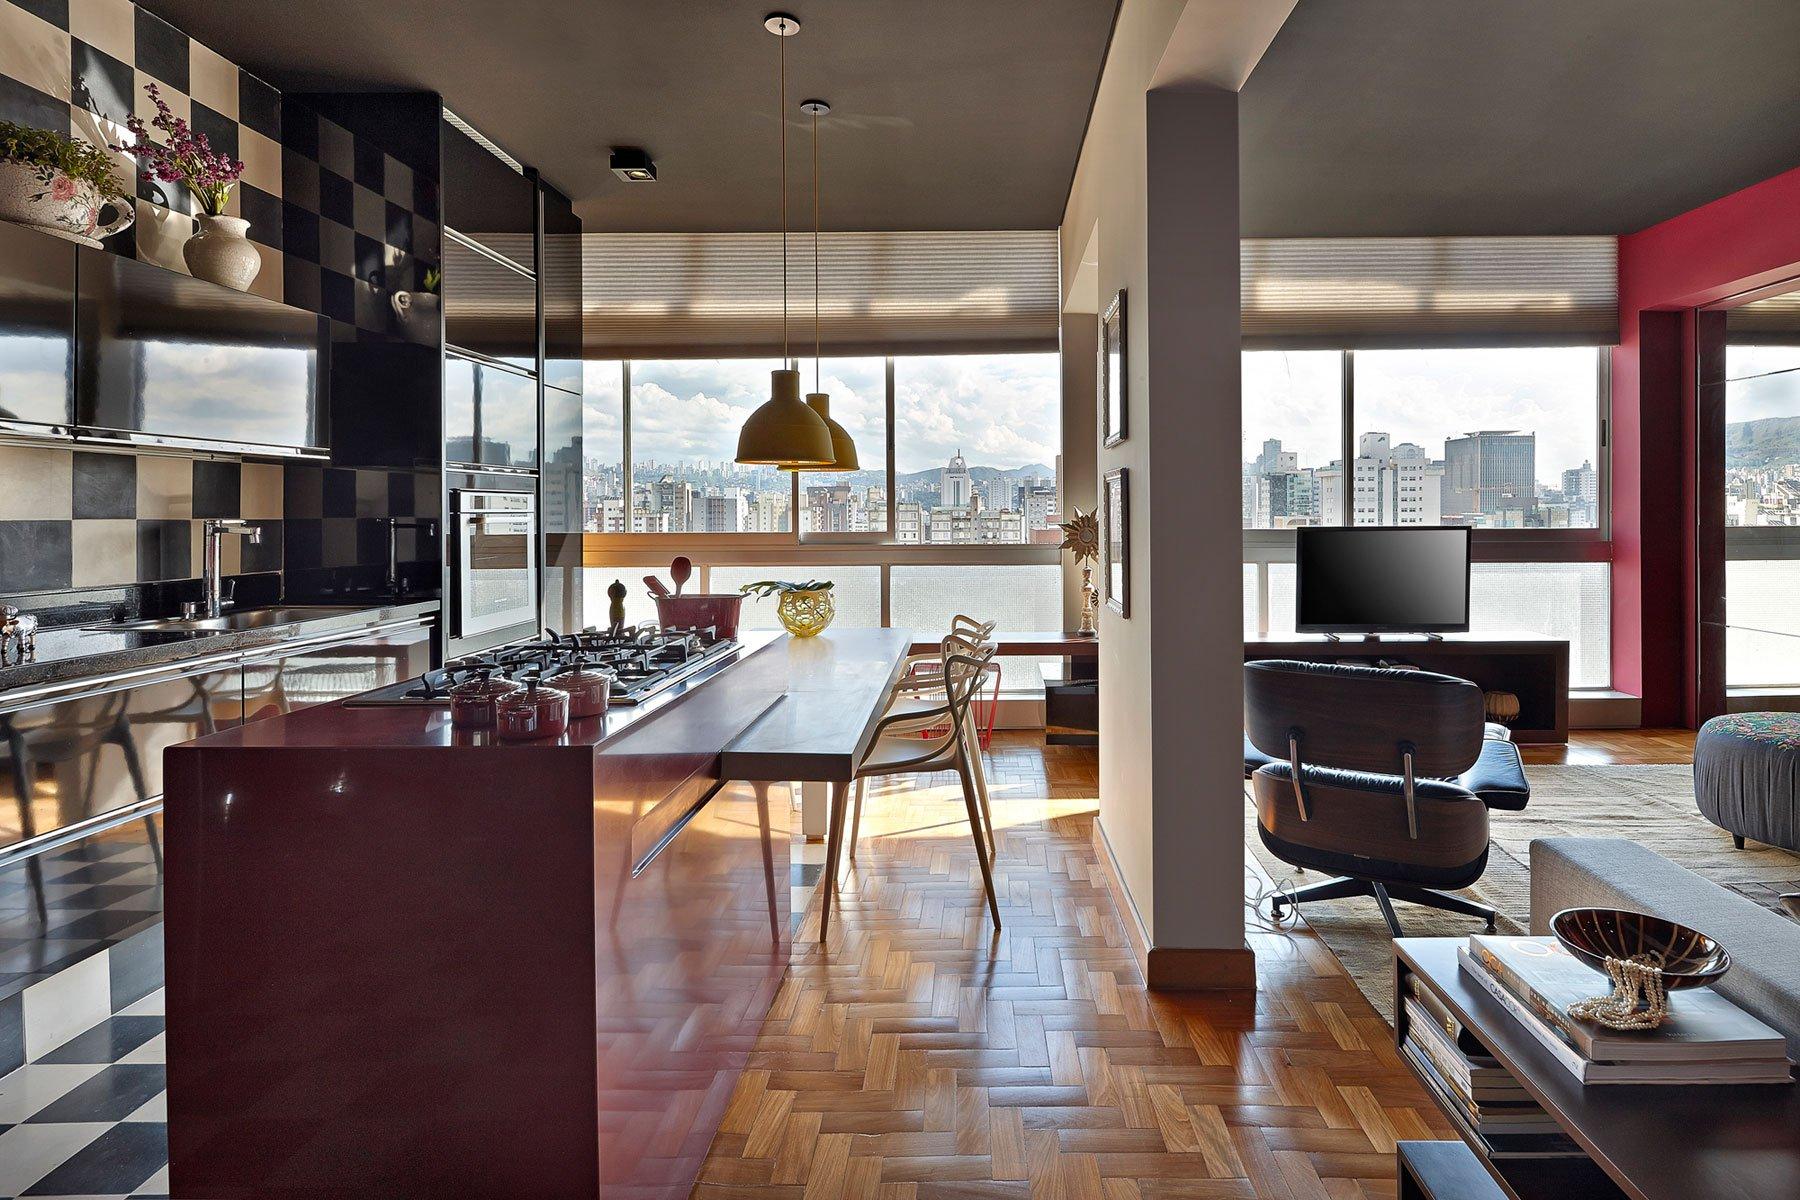 Apartment-in-Belo-Horizonte-09